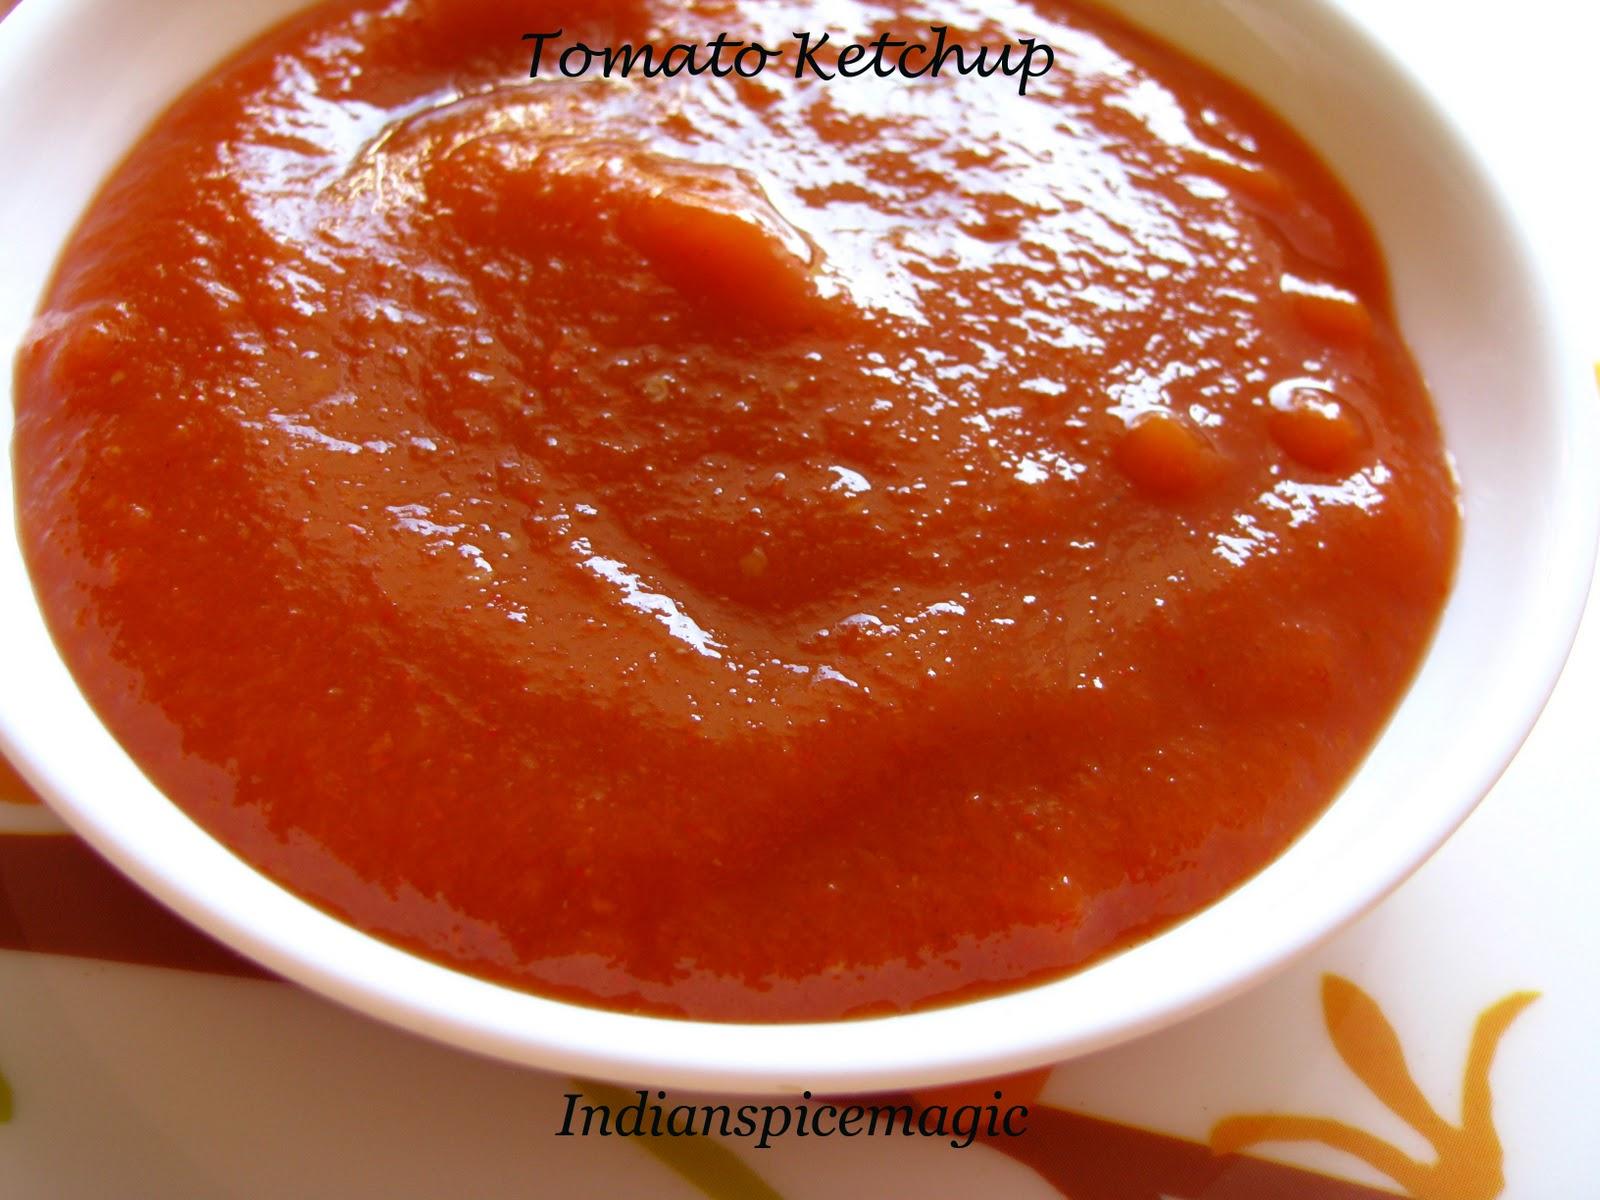 Indianspicemagic Homemade Tomato Sauce Ketchup